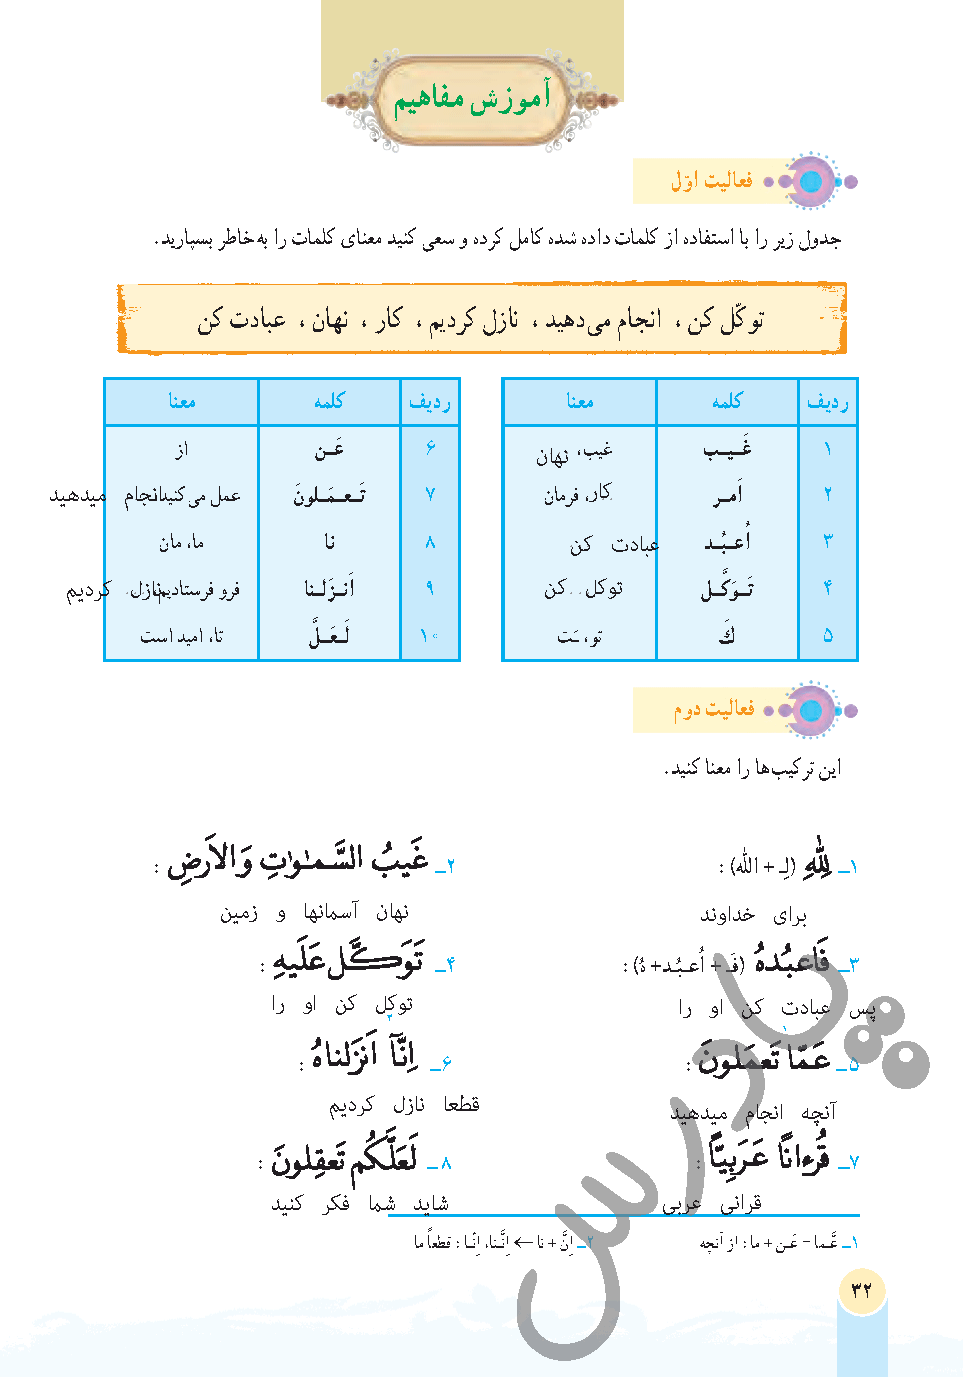 پاسخ فعالیت درس 3 قرآن هفتم - جلسه اول